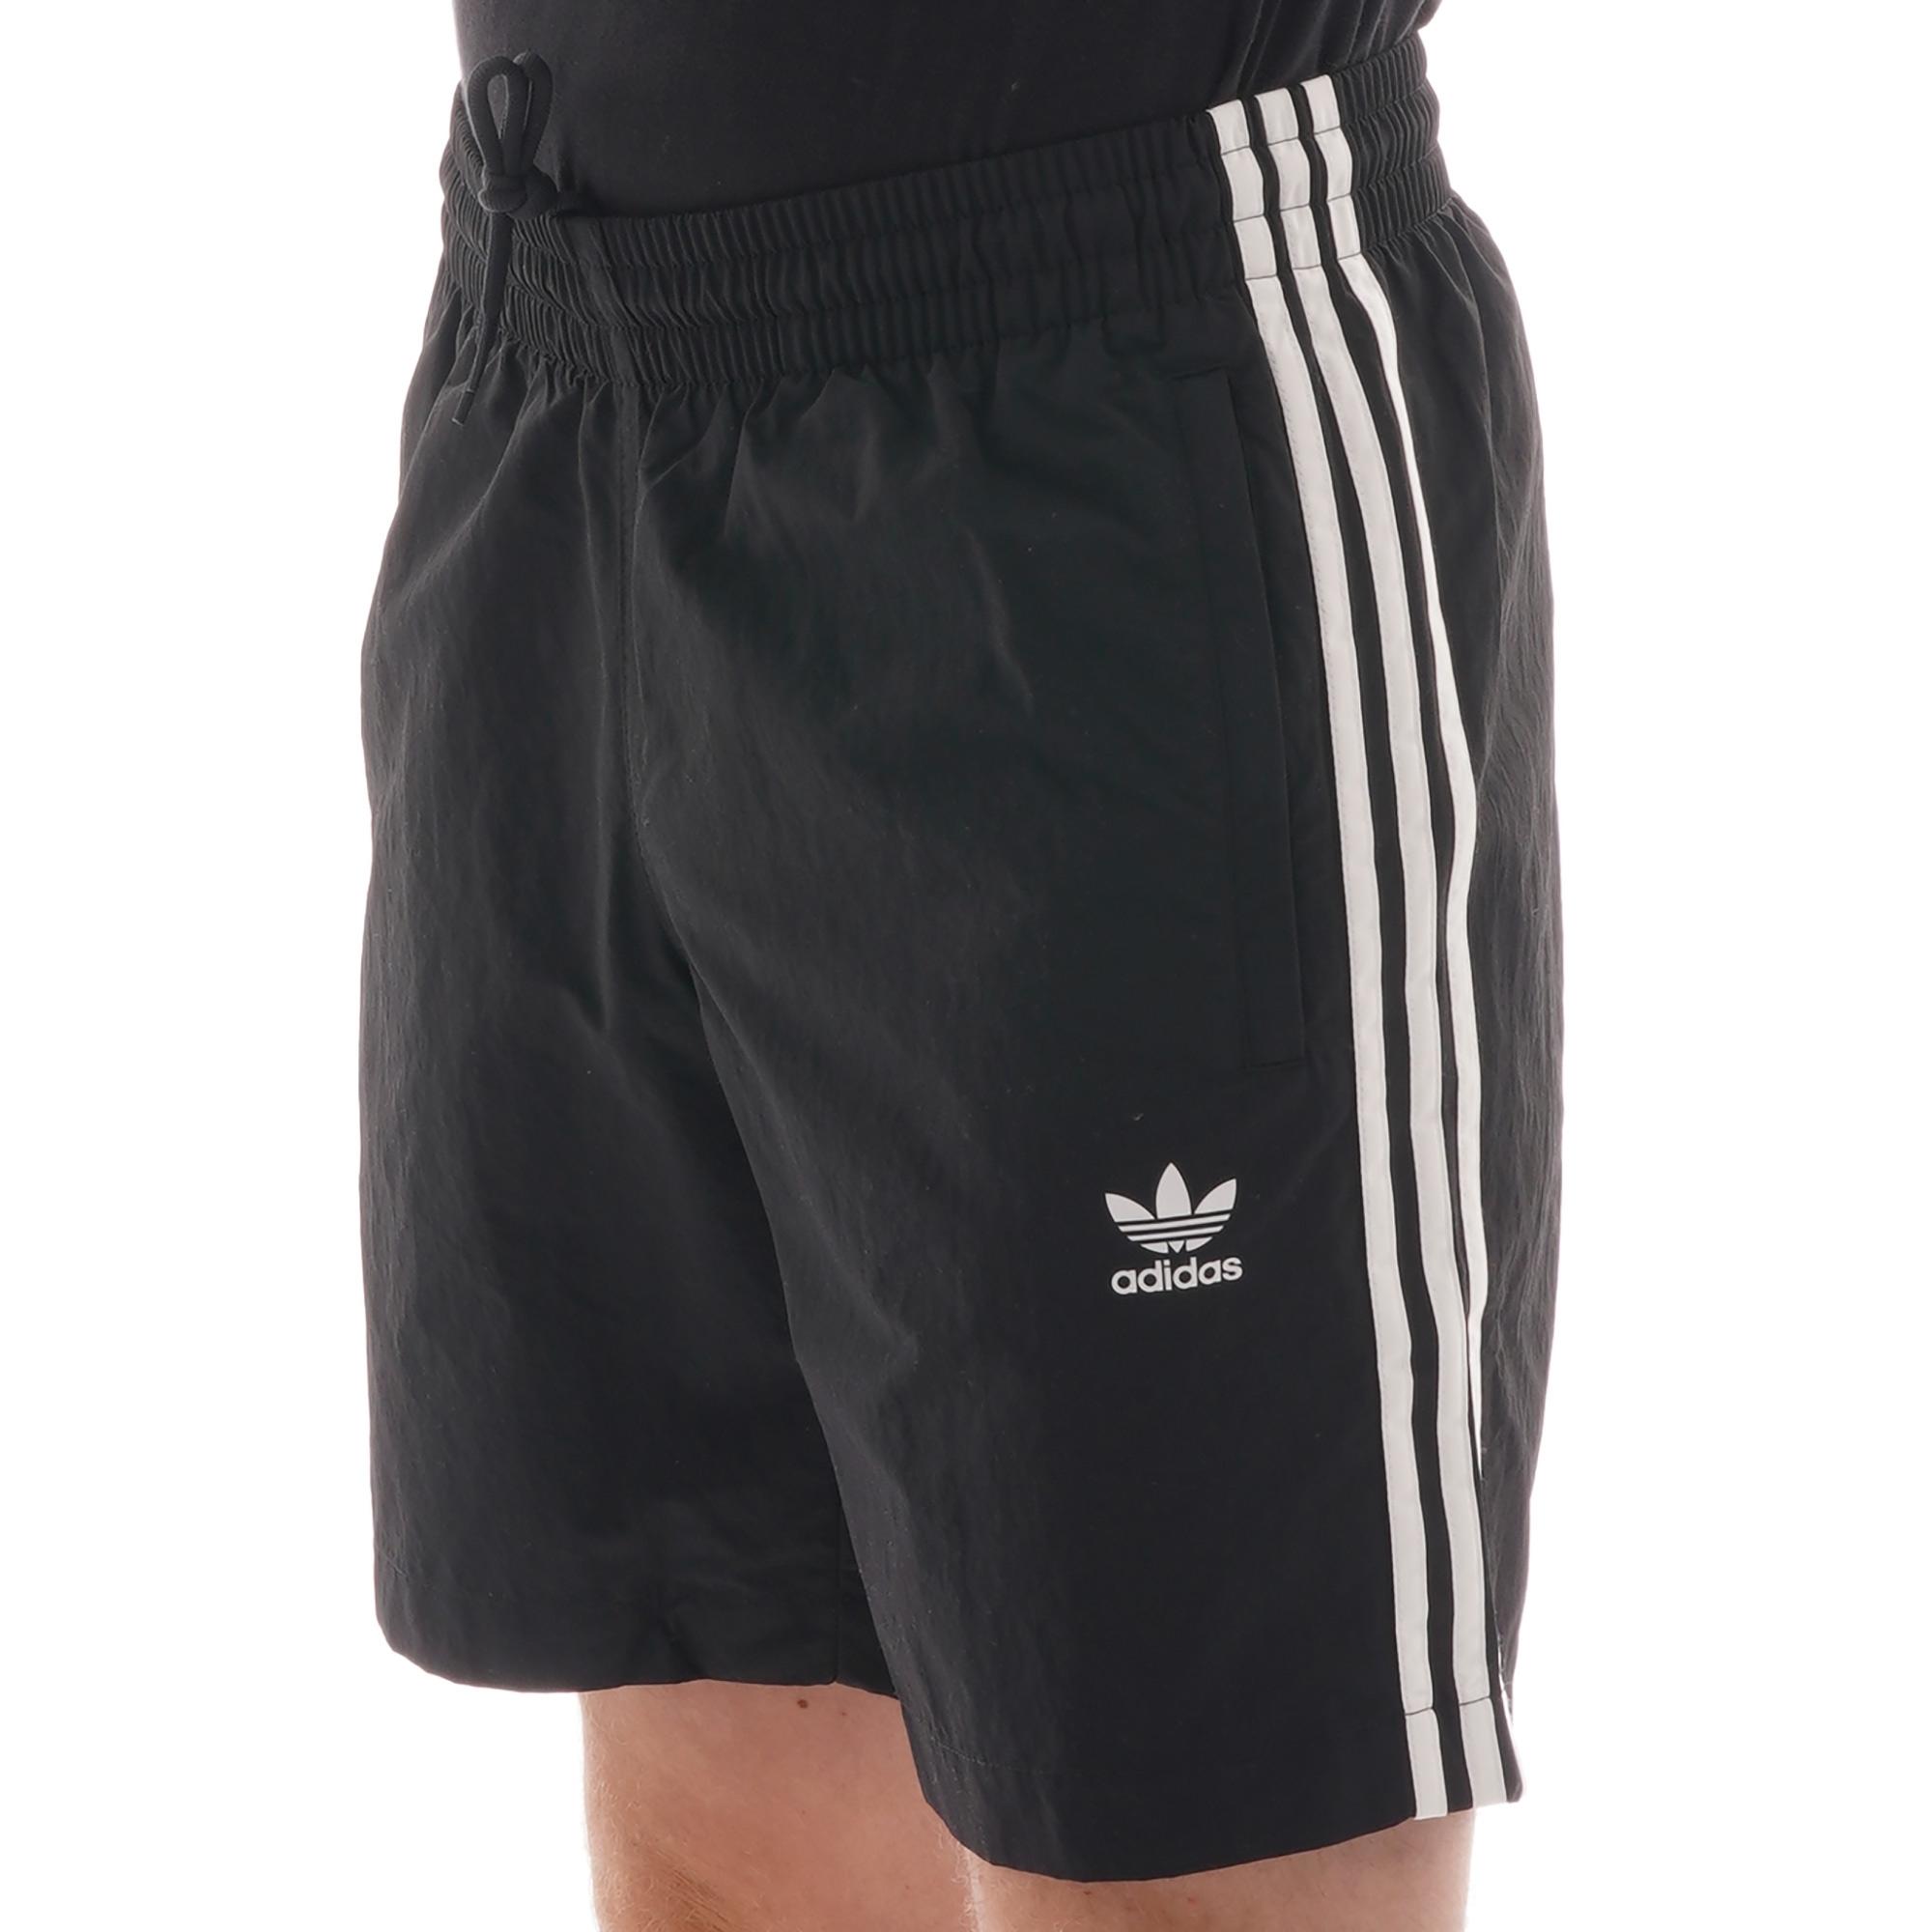 adidas Originals Adidas 3 stripe swim shorts Black